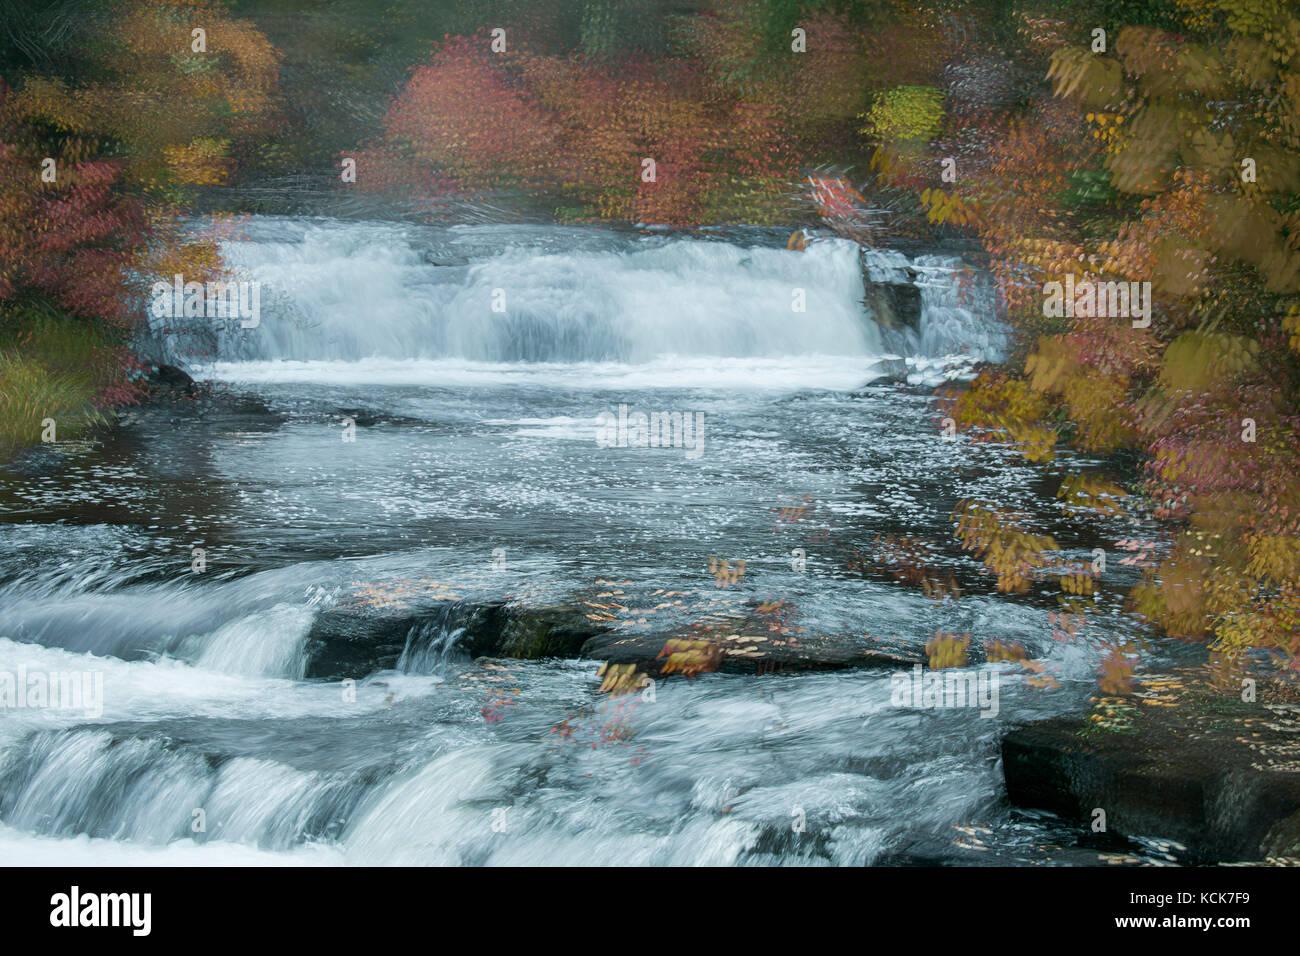 Canada, British Columbia, Centennial Park, 100 Mile House, Cariboo, Bridge Creek Falls, abstract landscape, autumn, - Stock Image